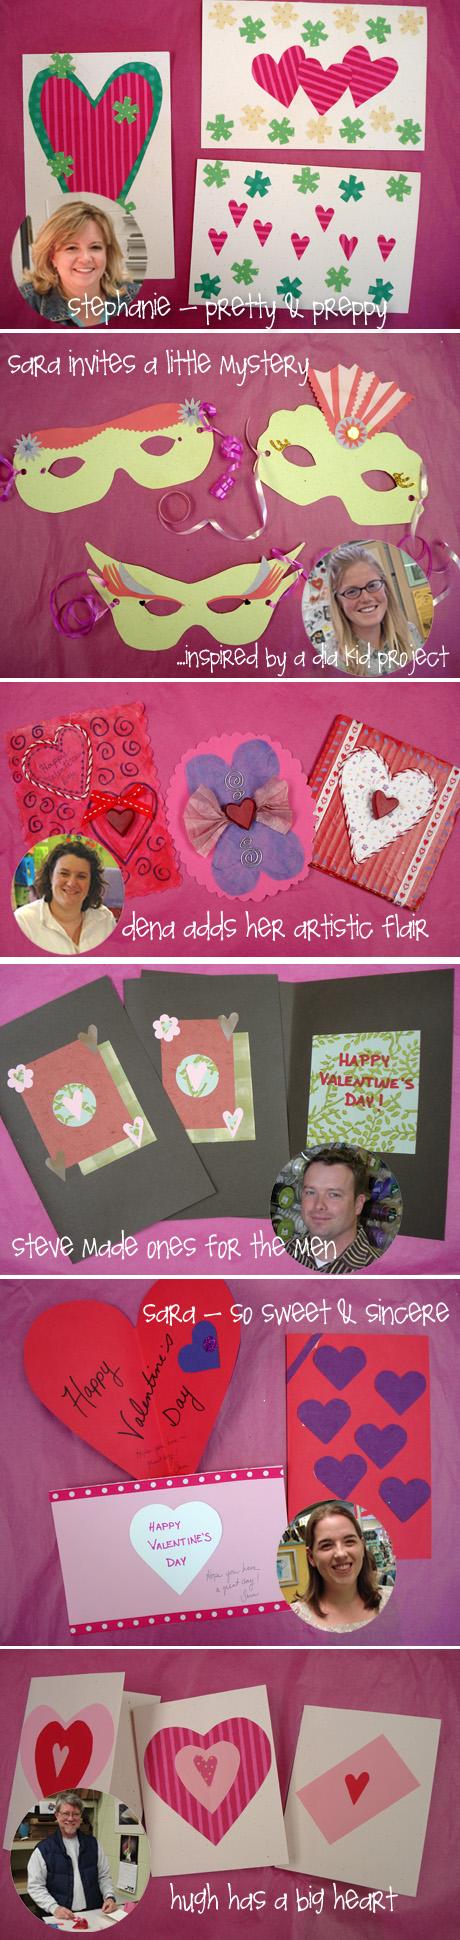 Staff cards2